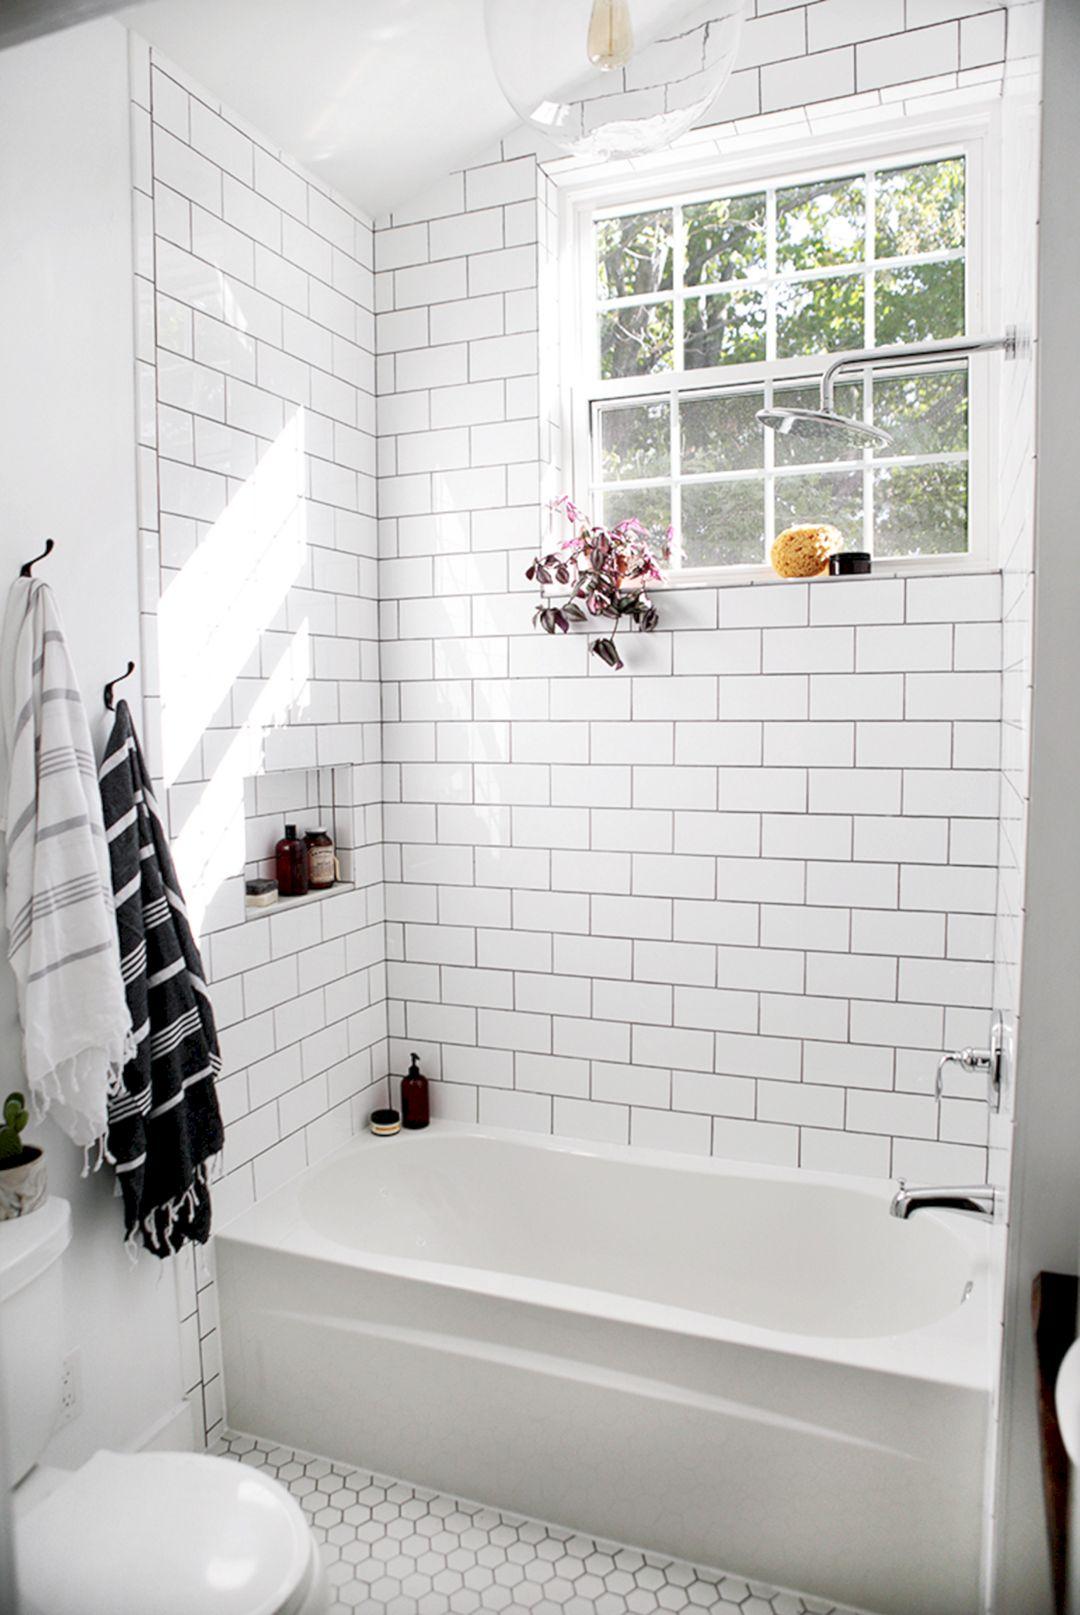 Awesome Ceramic Tile For Bathroom 65 Best Inspirations FresHOUZcom